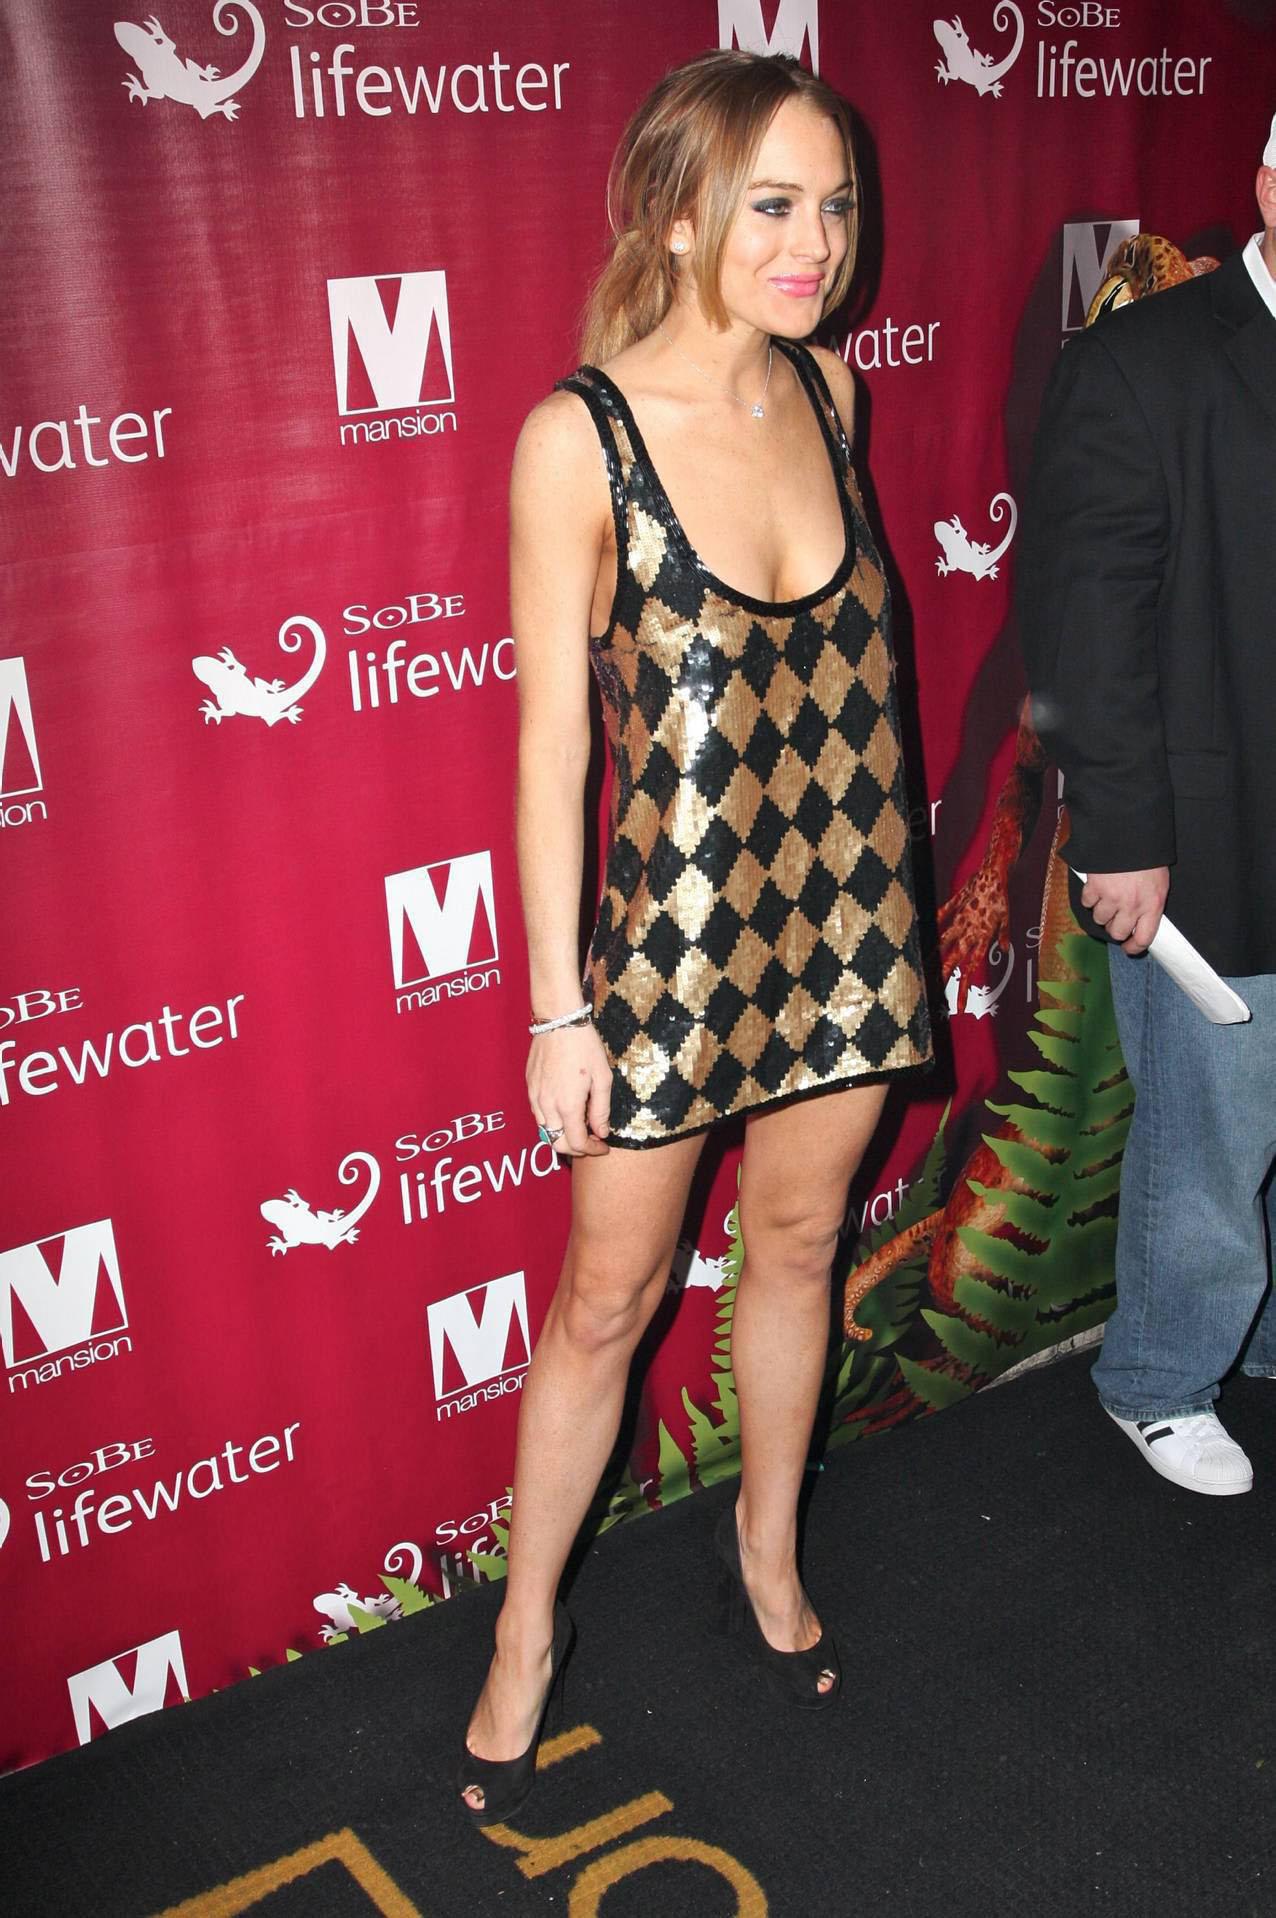 38001_Lindsay_Lohan_at_Mansion_Nightclub_in_Miami_1-1-2009_006_122_1129lo.jpg